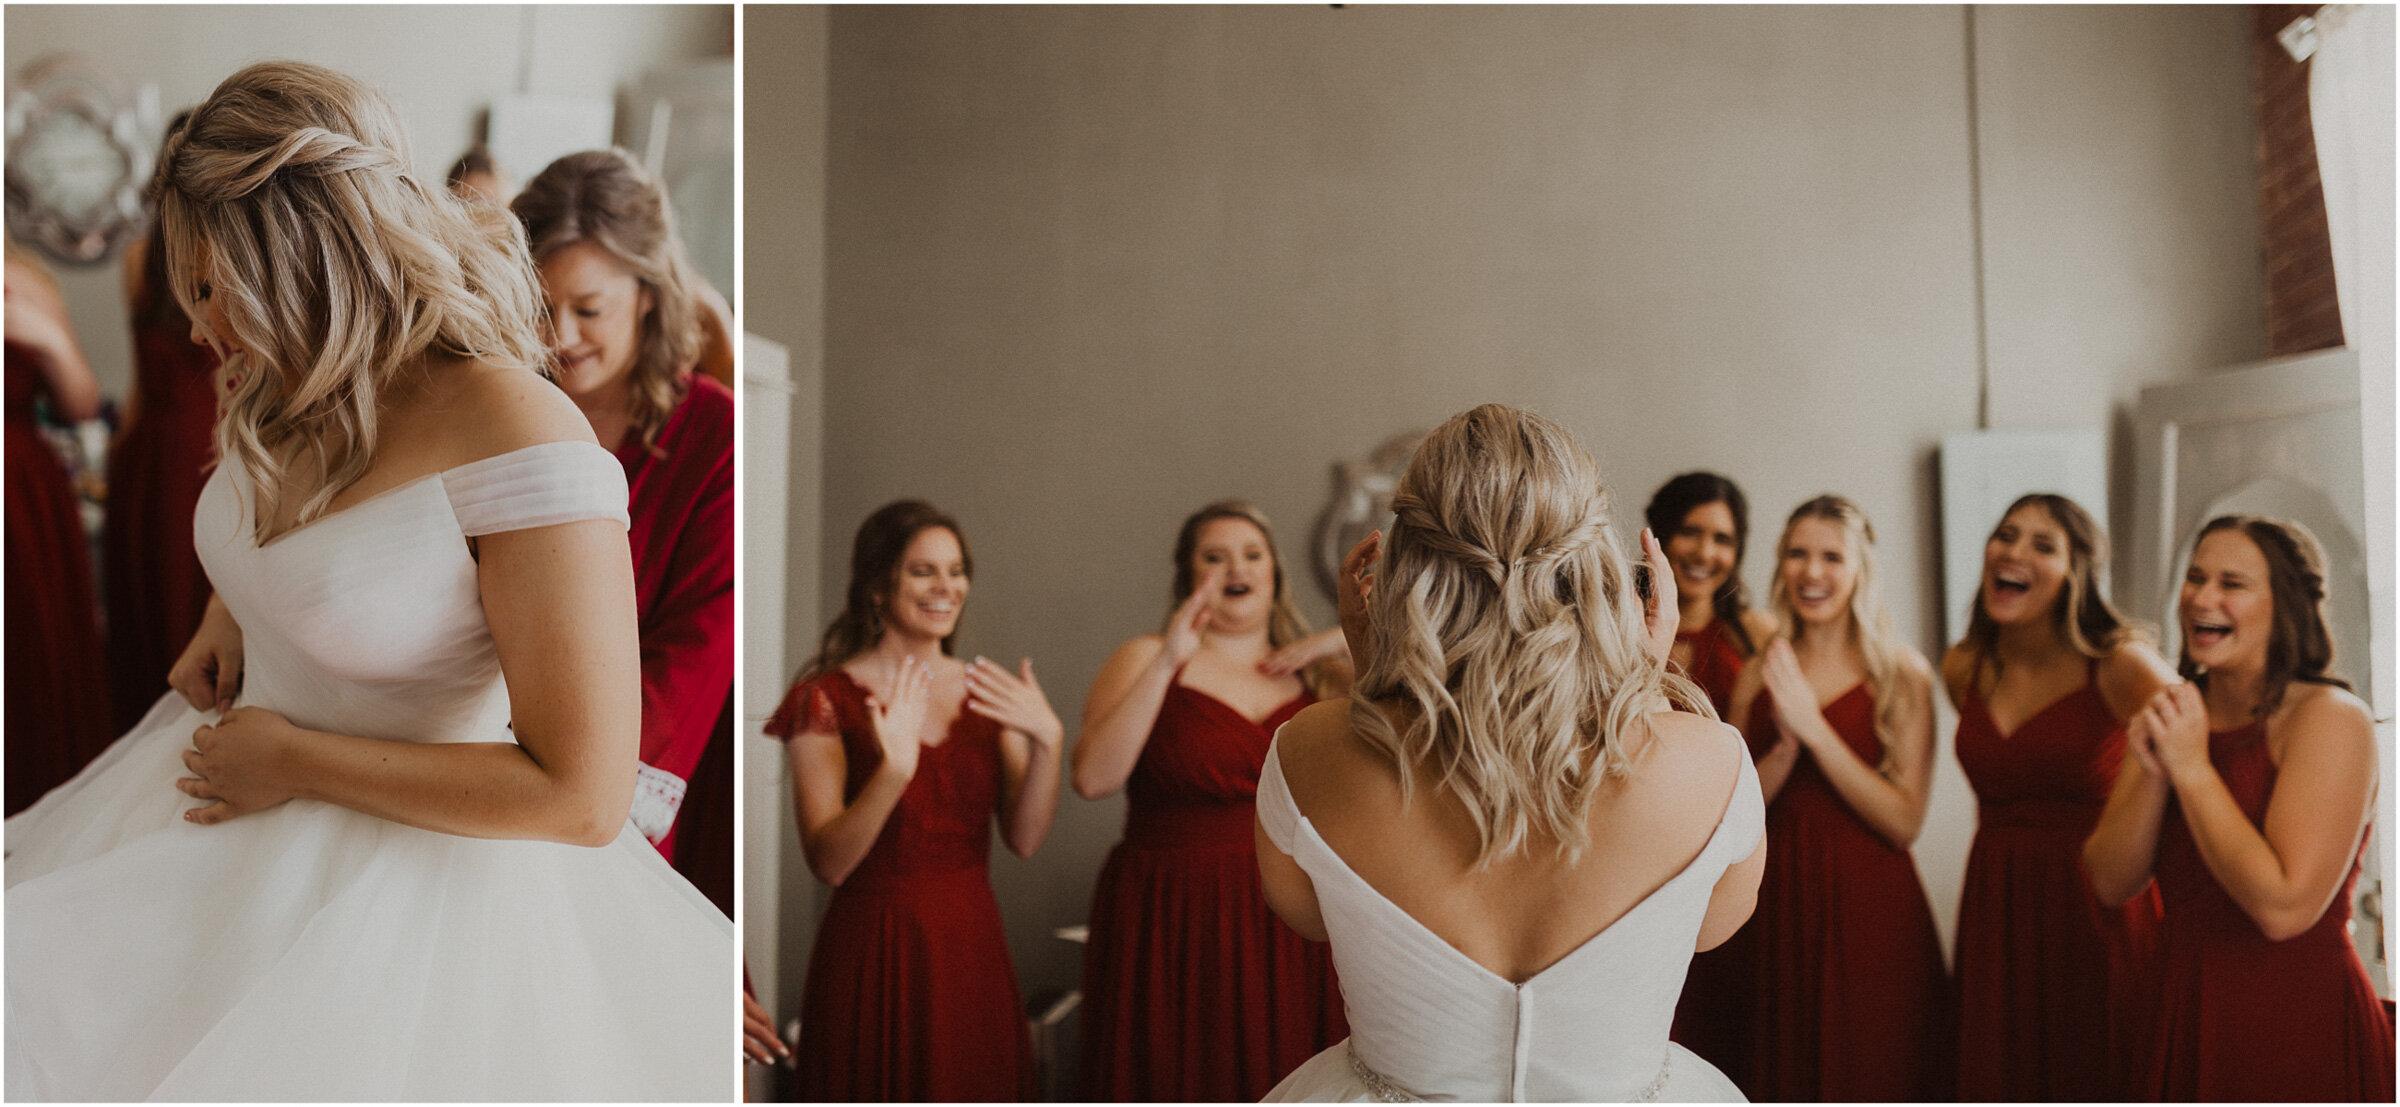 alyssa barletter photography town square paola wedding-4.jpg